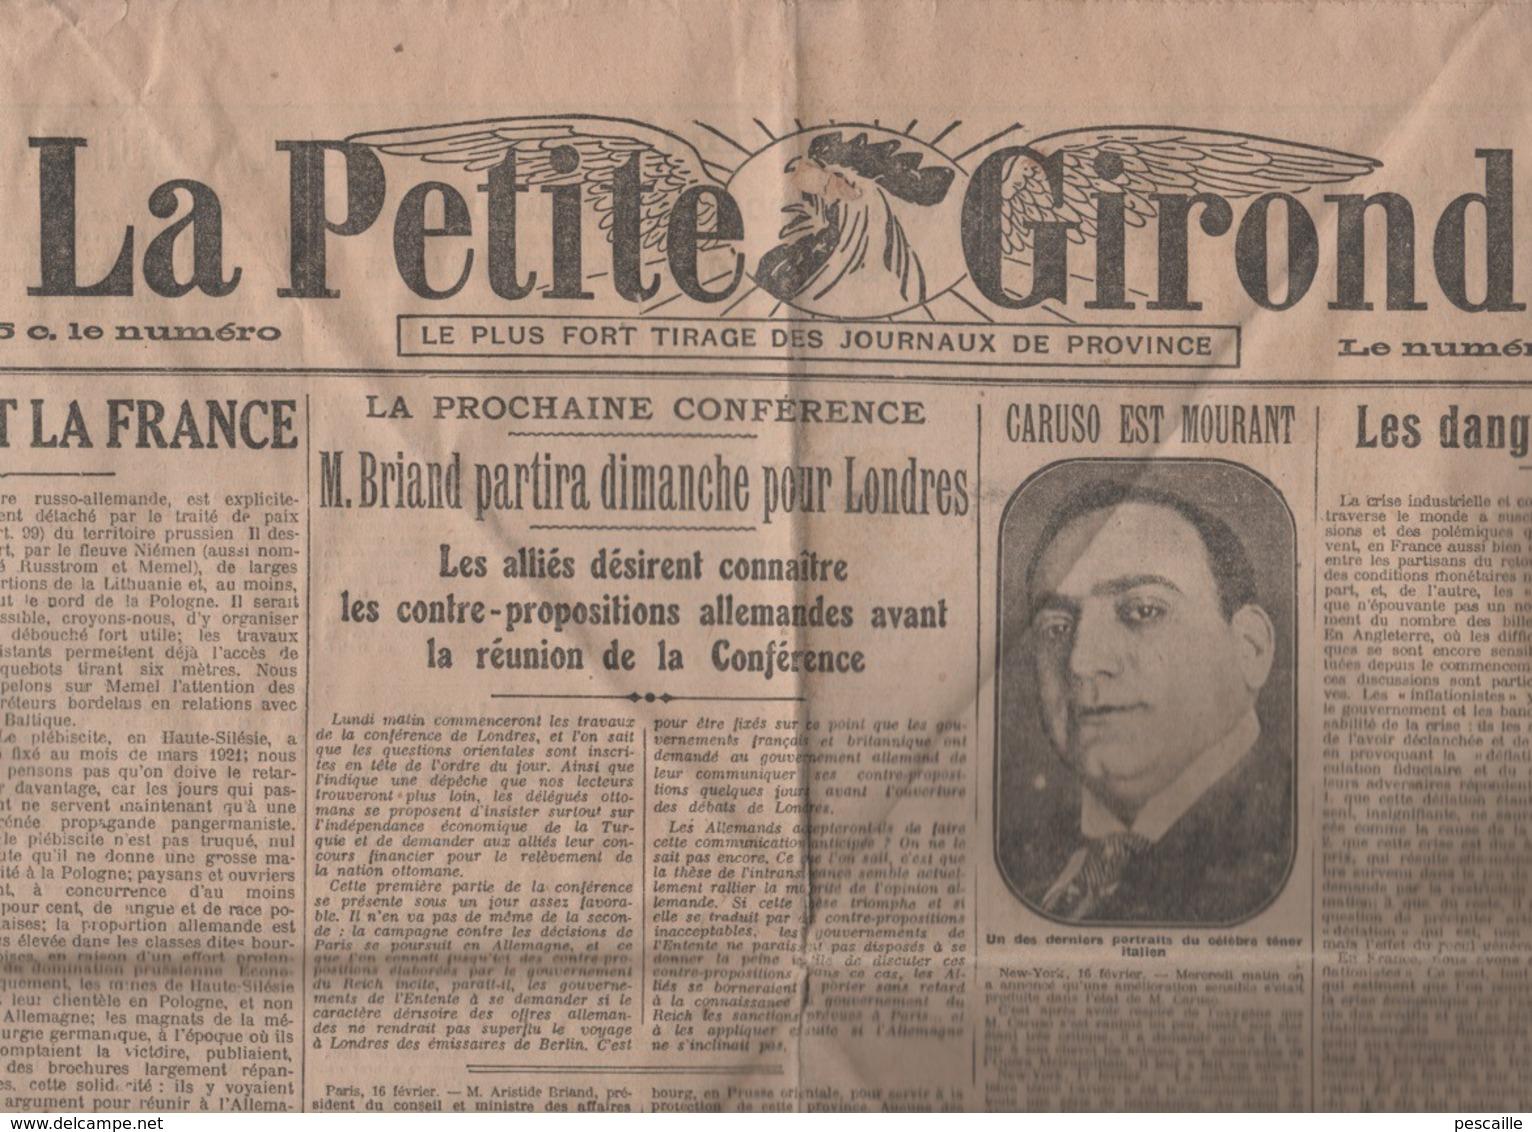 LA PETITE GIRONDE 18 02 1921 - TENOR CARUSO - POLOGNE & FRANCE - INFLATIONISME - COTON - LOUISE THULLIEZ WIHERIES - RHUM - Testi Generali